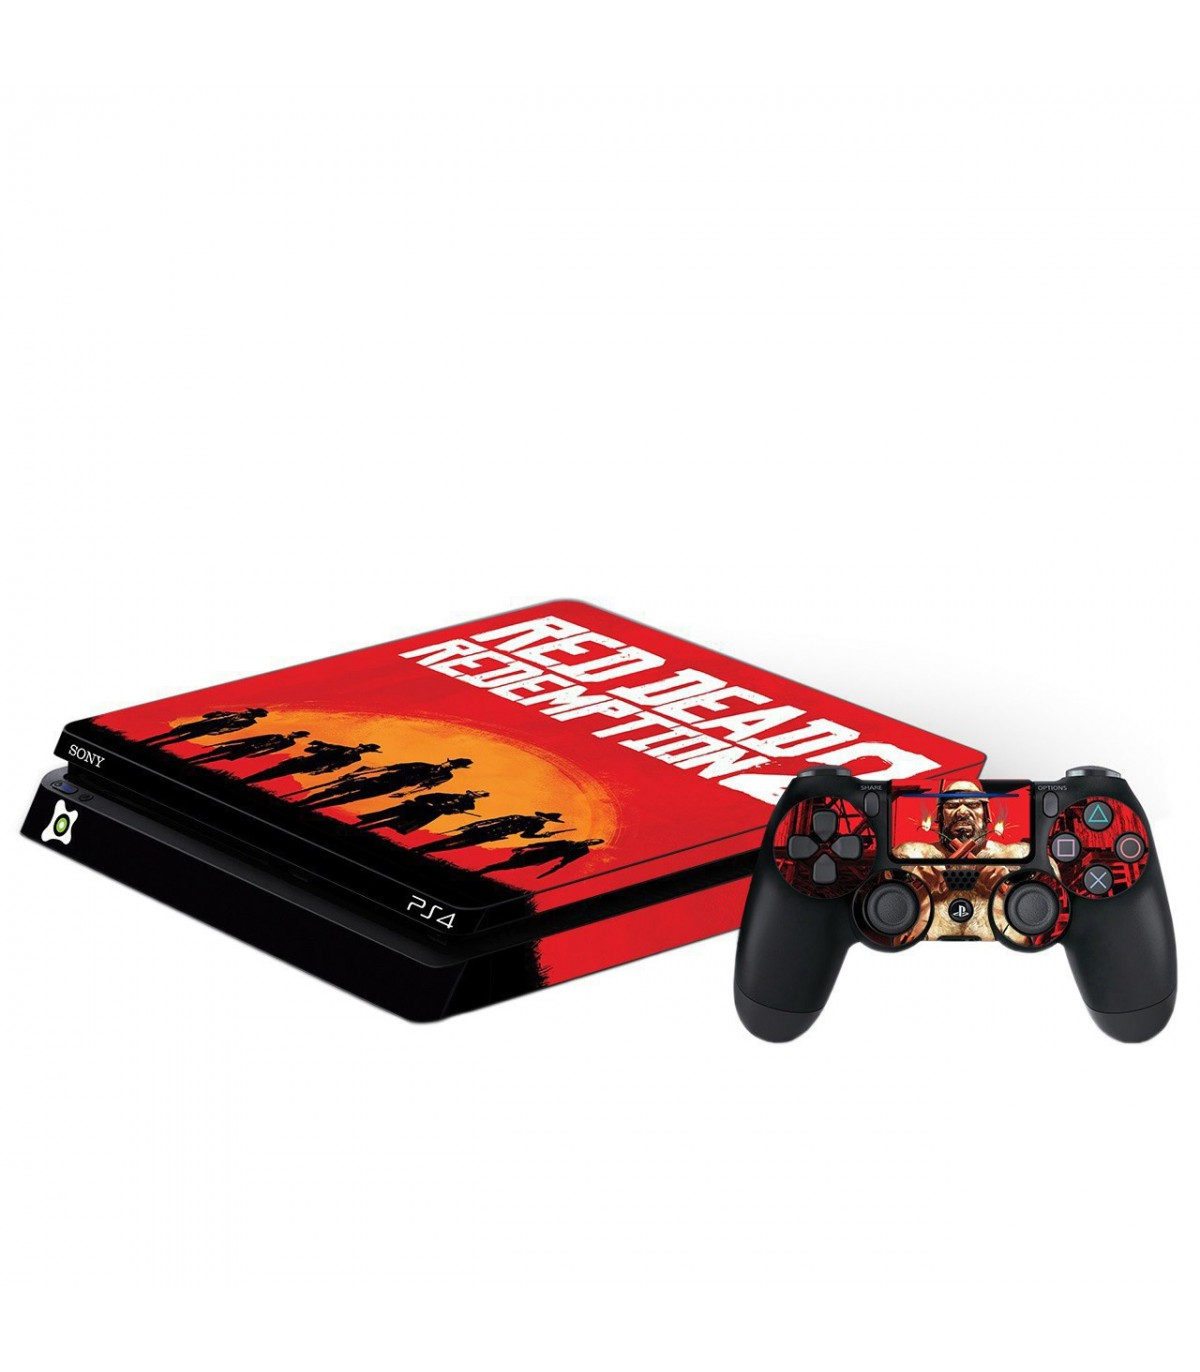 اسکین PS4 اسلیم طرح Red Dead 2